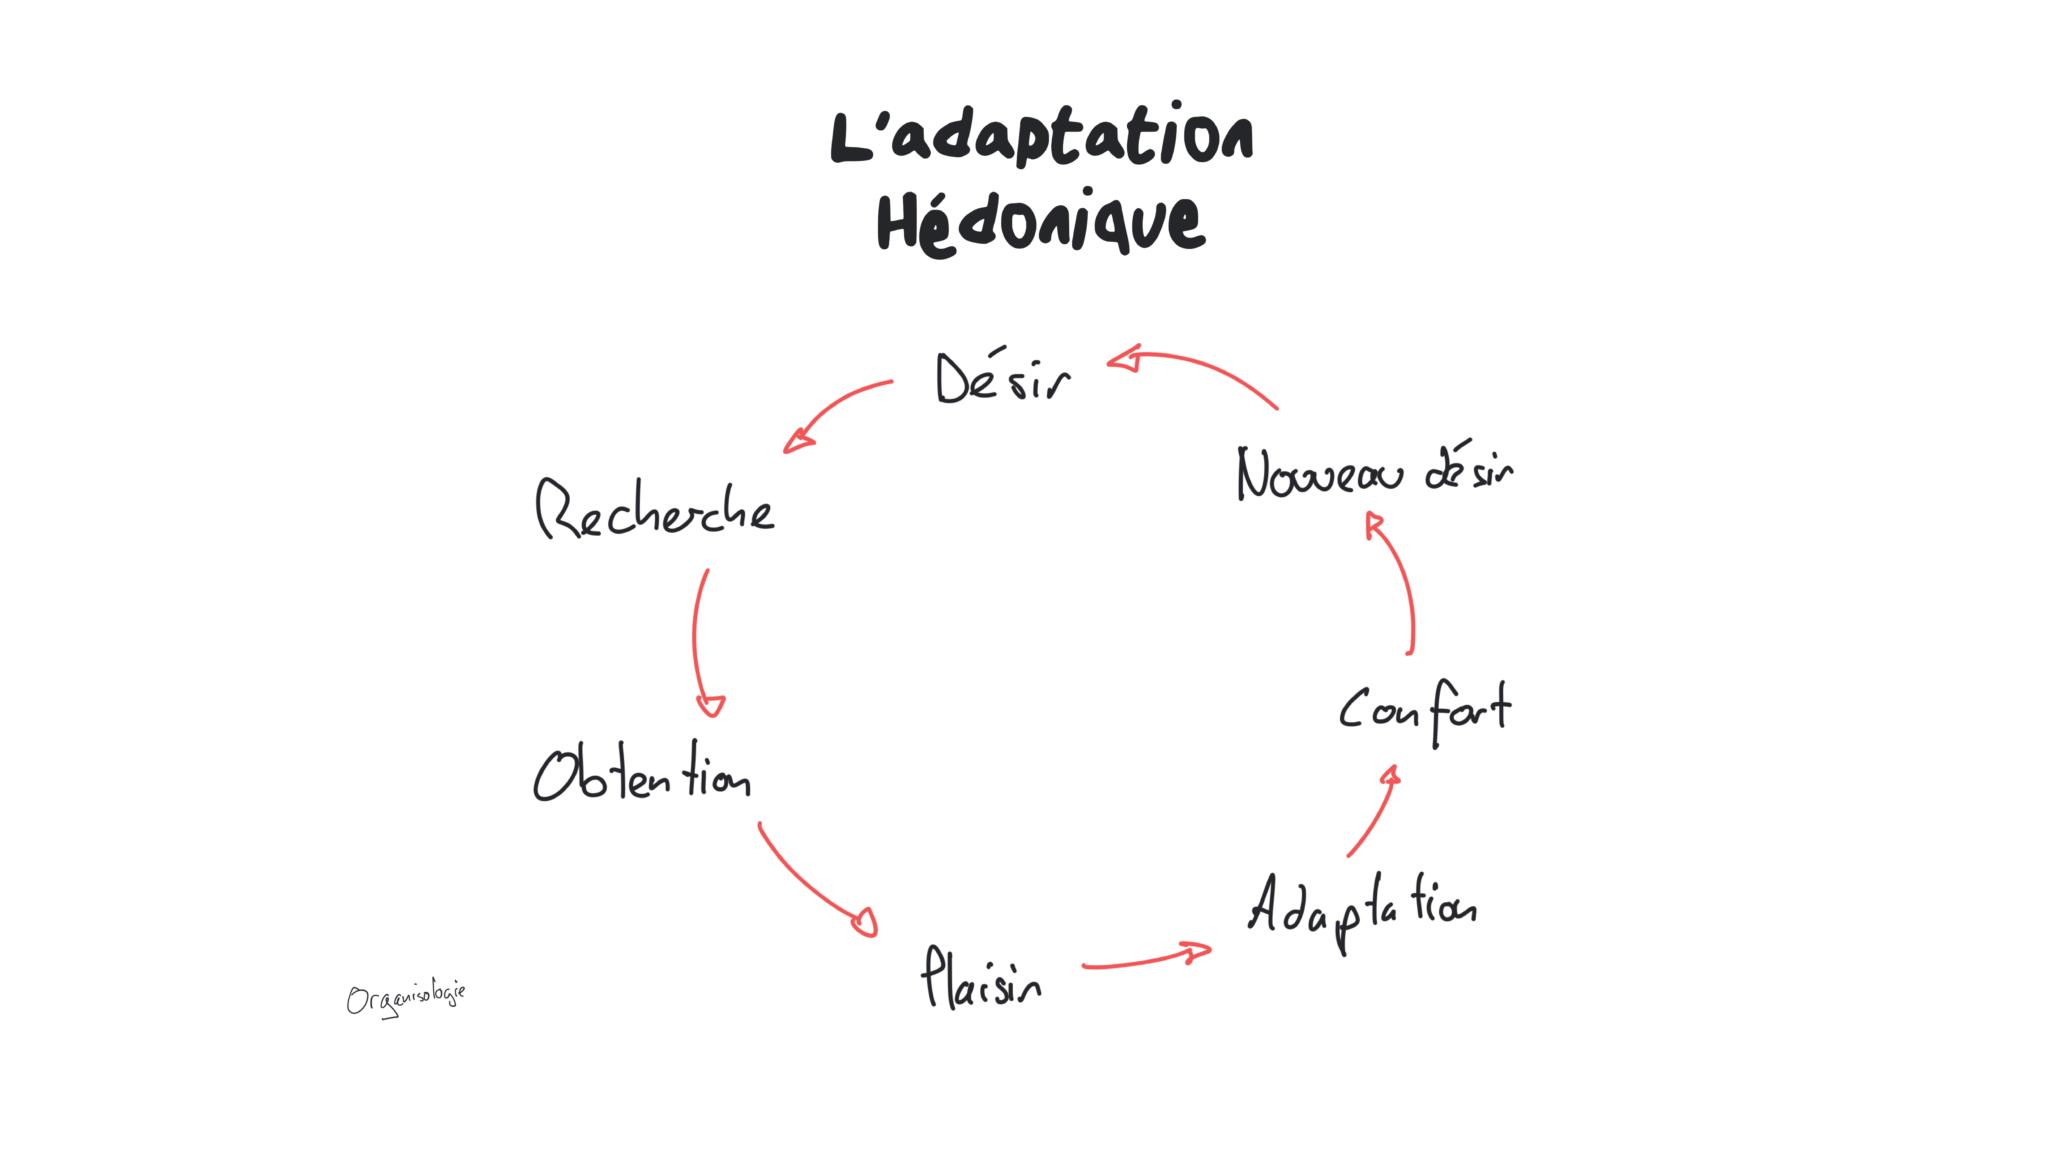 adaptation hédonique